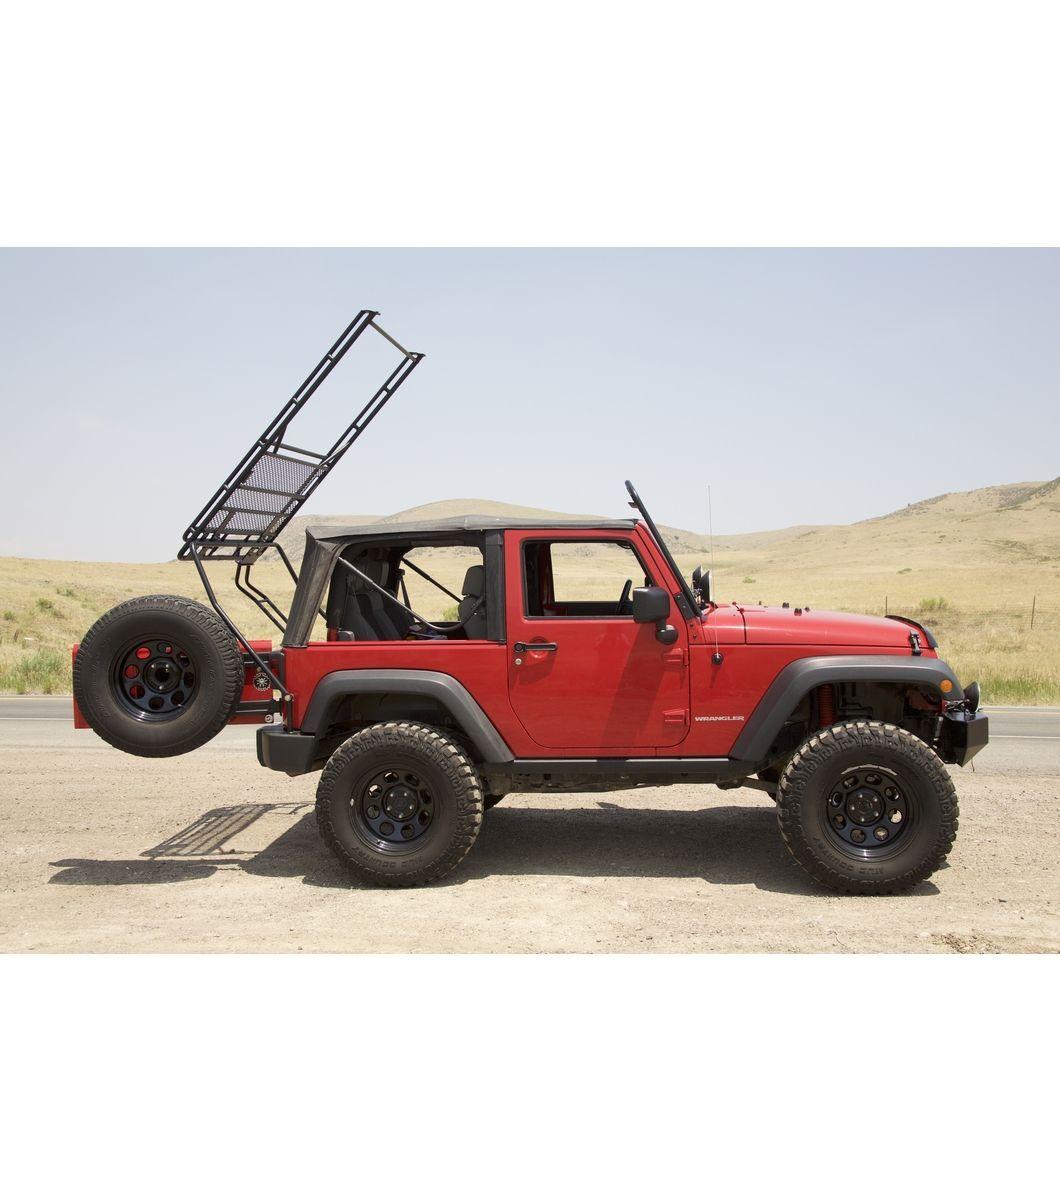 JEEP WRANGLER JK Gobi Racks liftedjeep Jeep wrangler